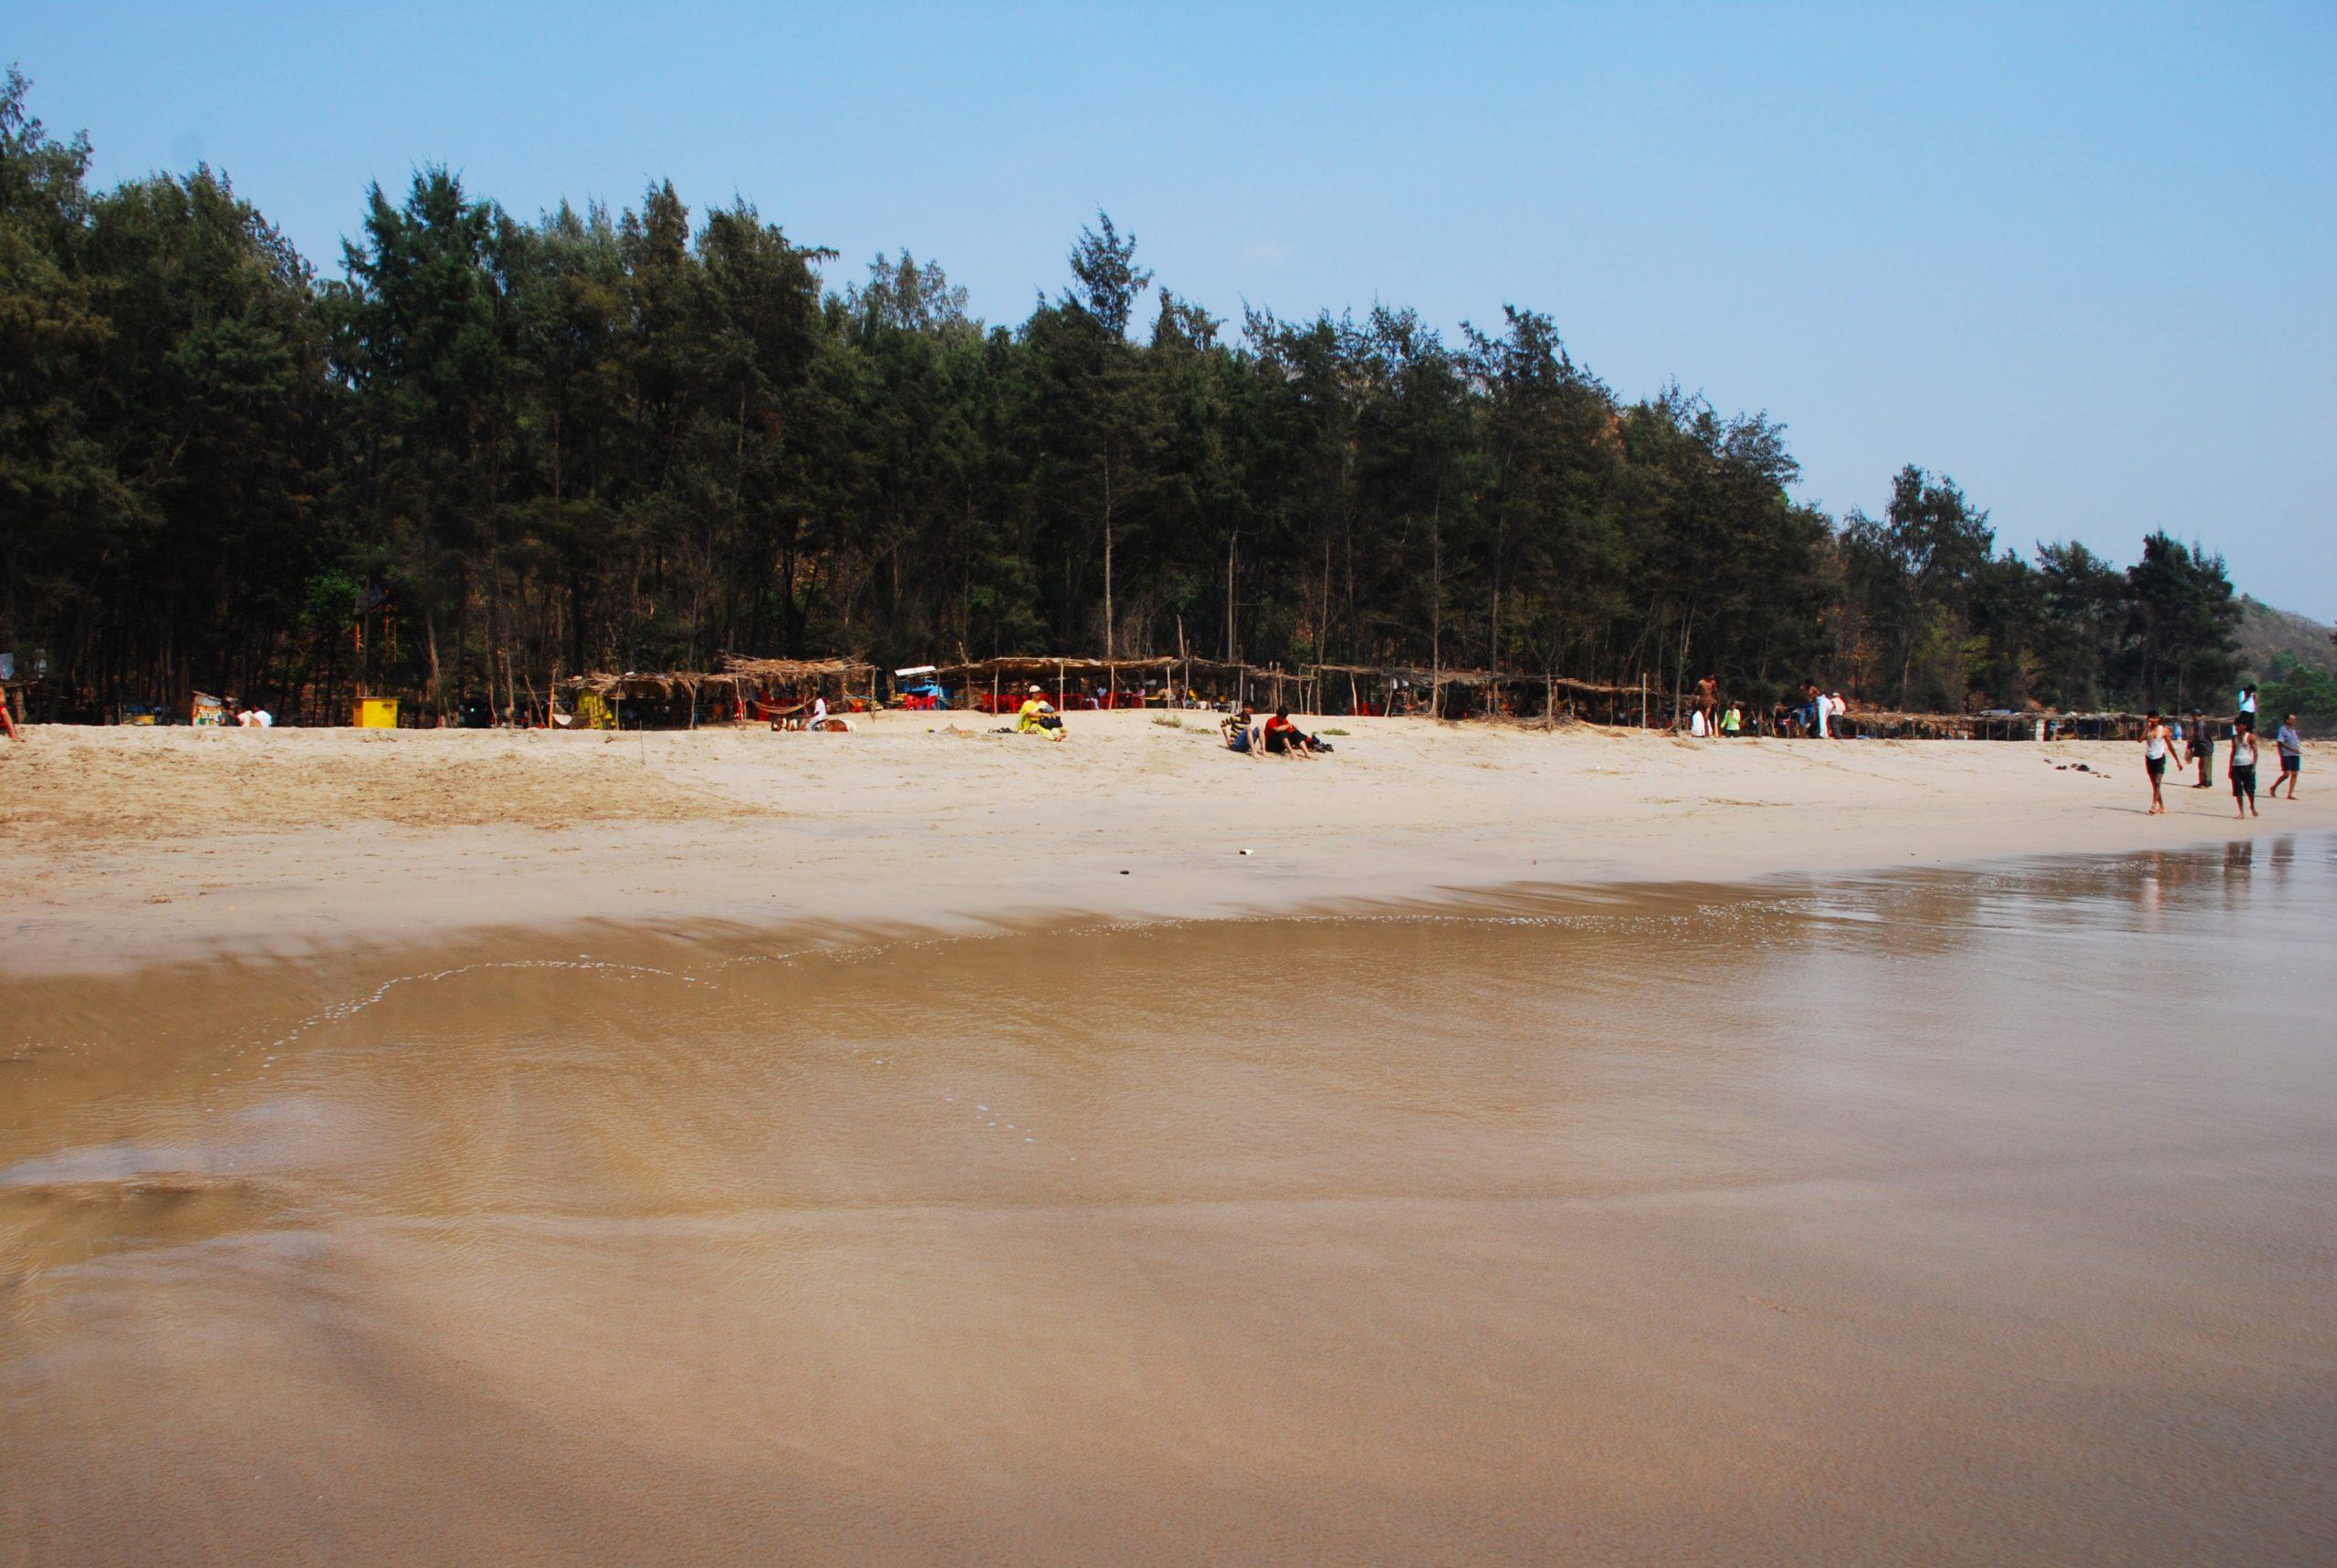 Kashid Beach Don't Miss This Best Beache Near Mumbai (Within 350 Kms)